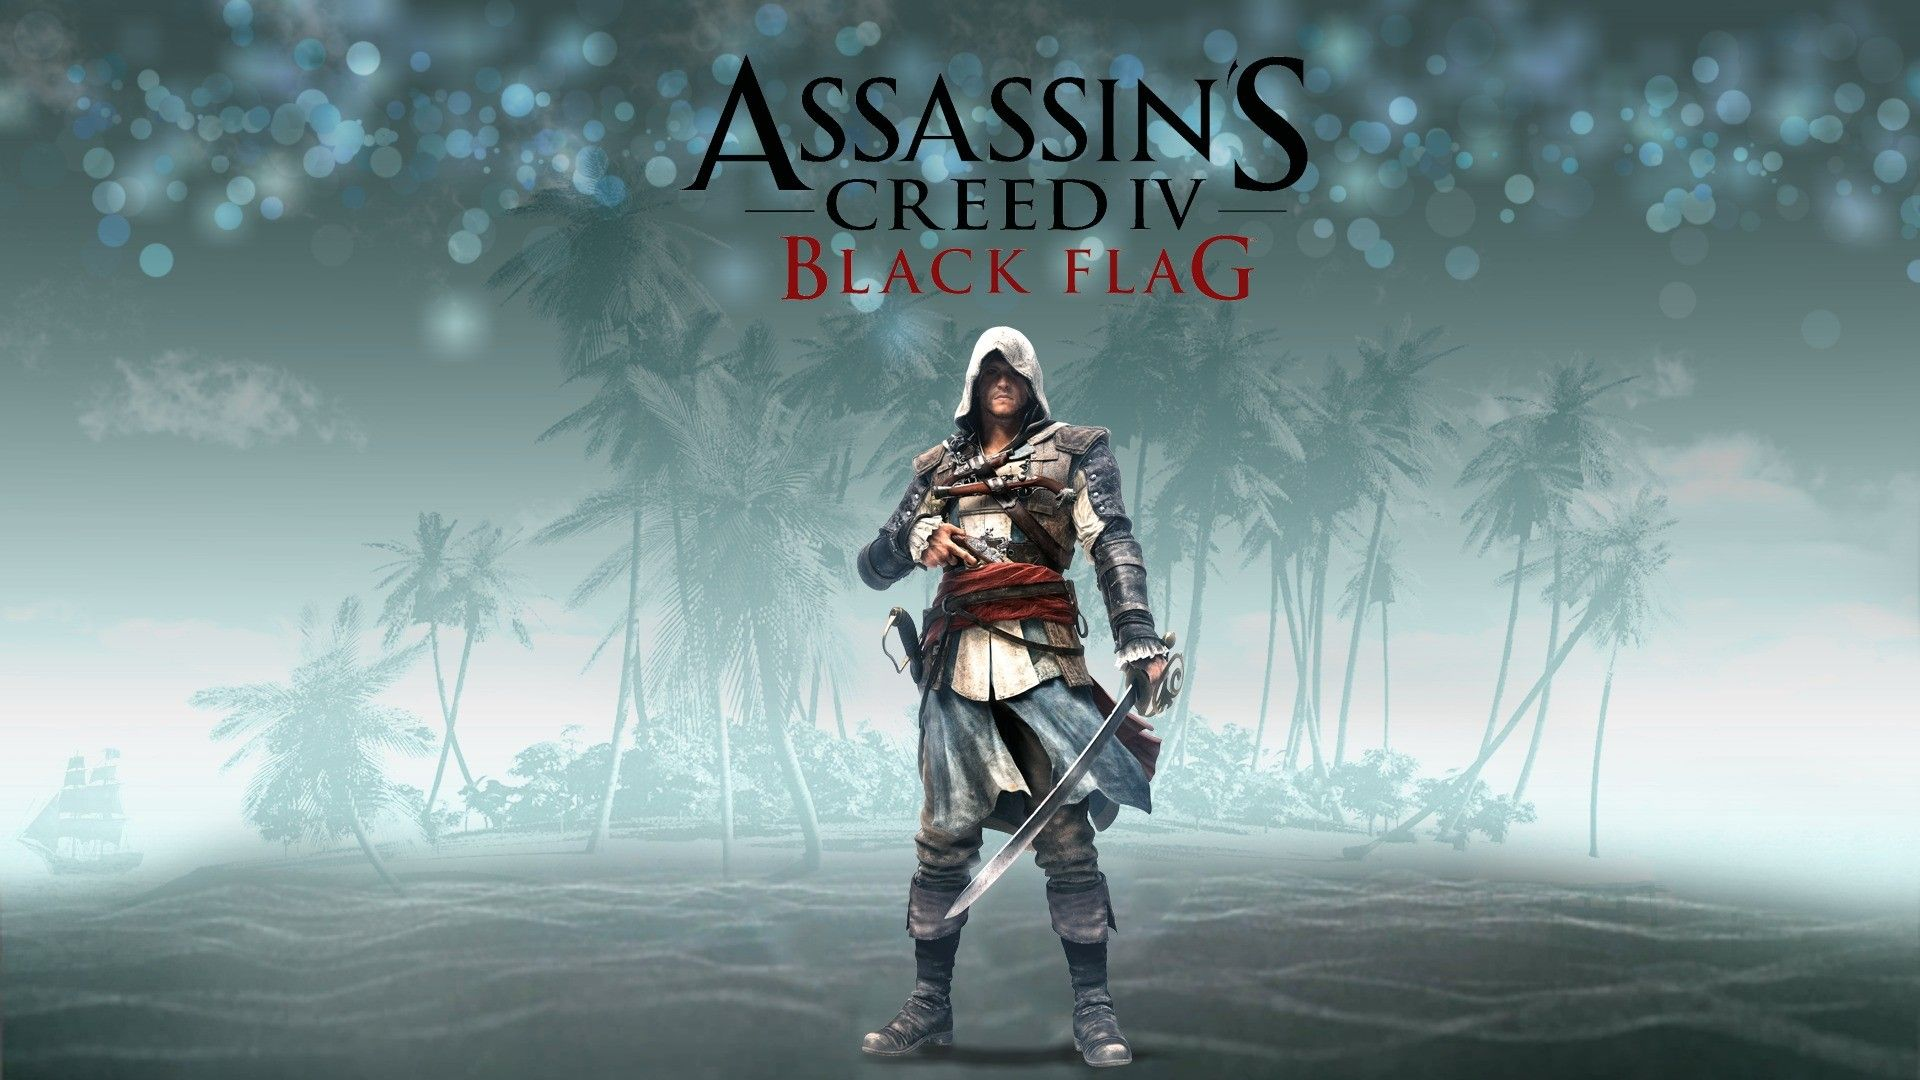 Top Games Like Assassins Creed 4 Black Flag 91 games